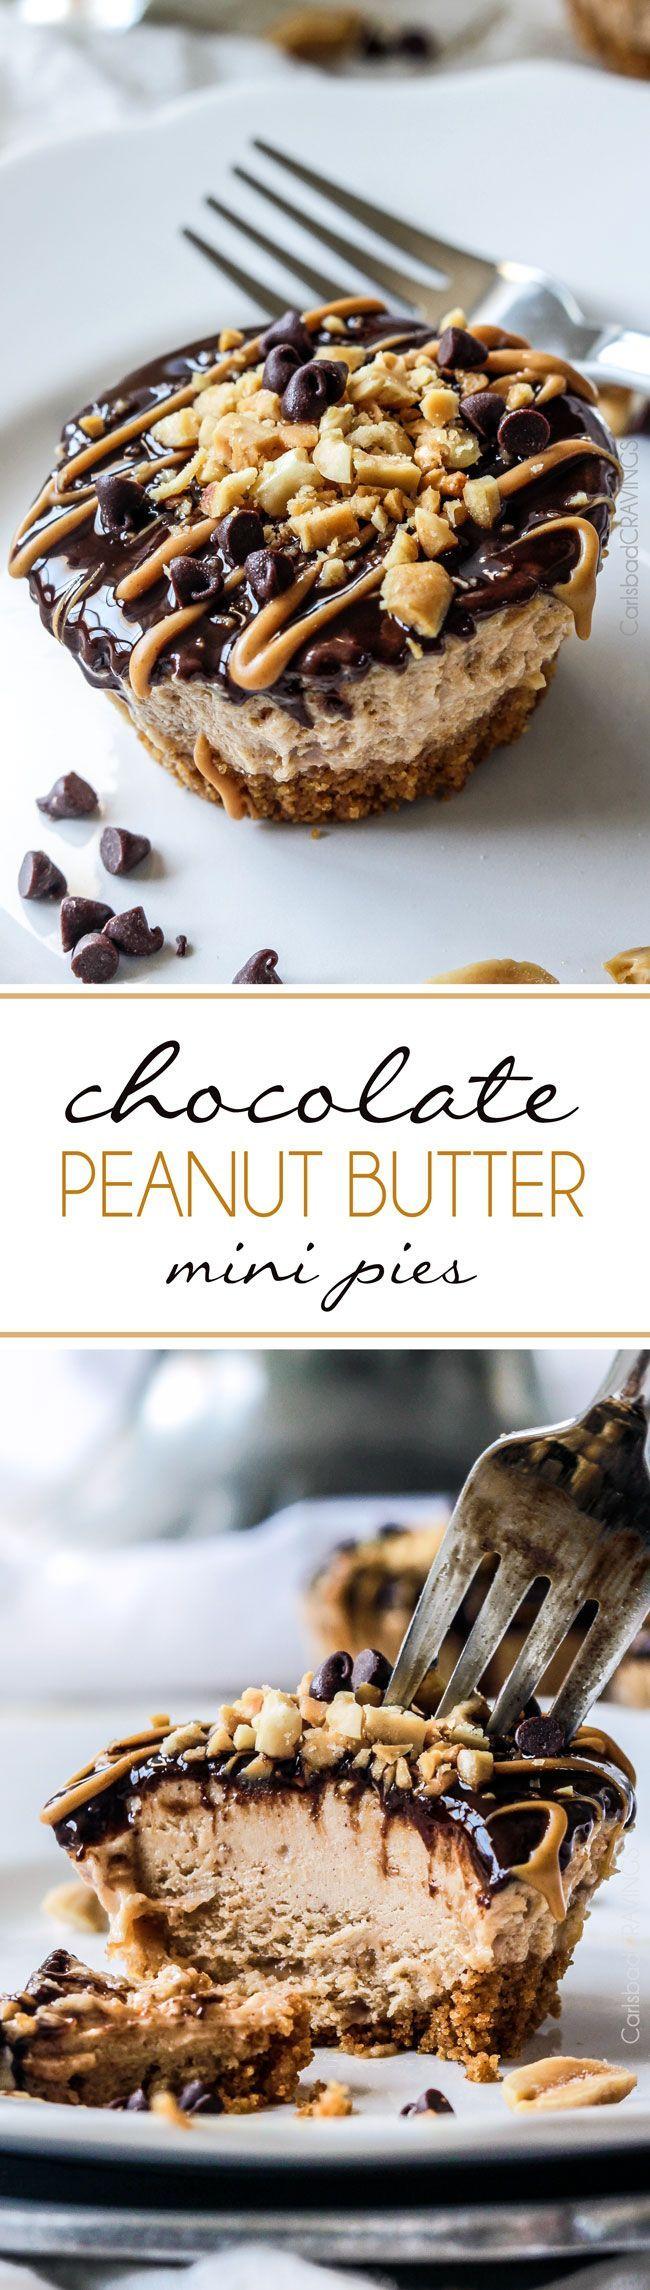 Mini Chocolate Peanut Butter Pies  http://www.carlsbadcravings.com/almost-no-bake-mini-chocolate-peanut-butter-pies-recipe/